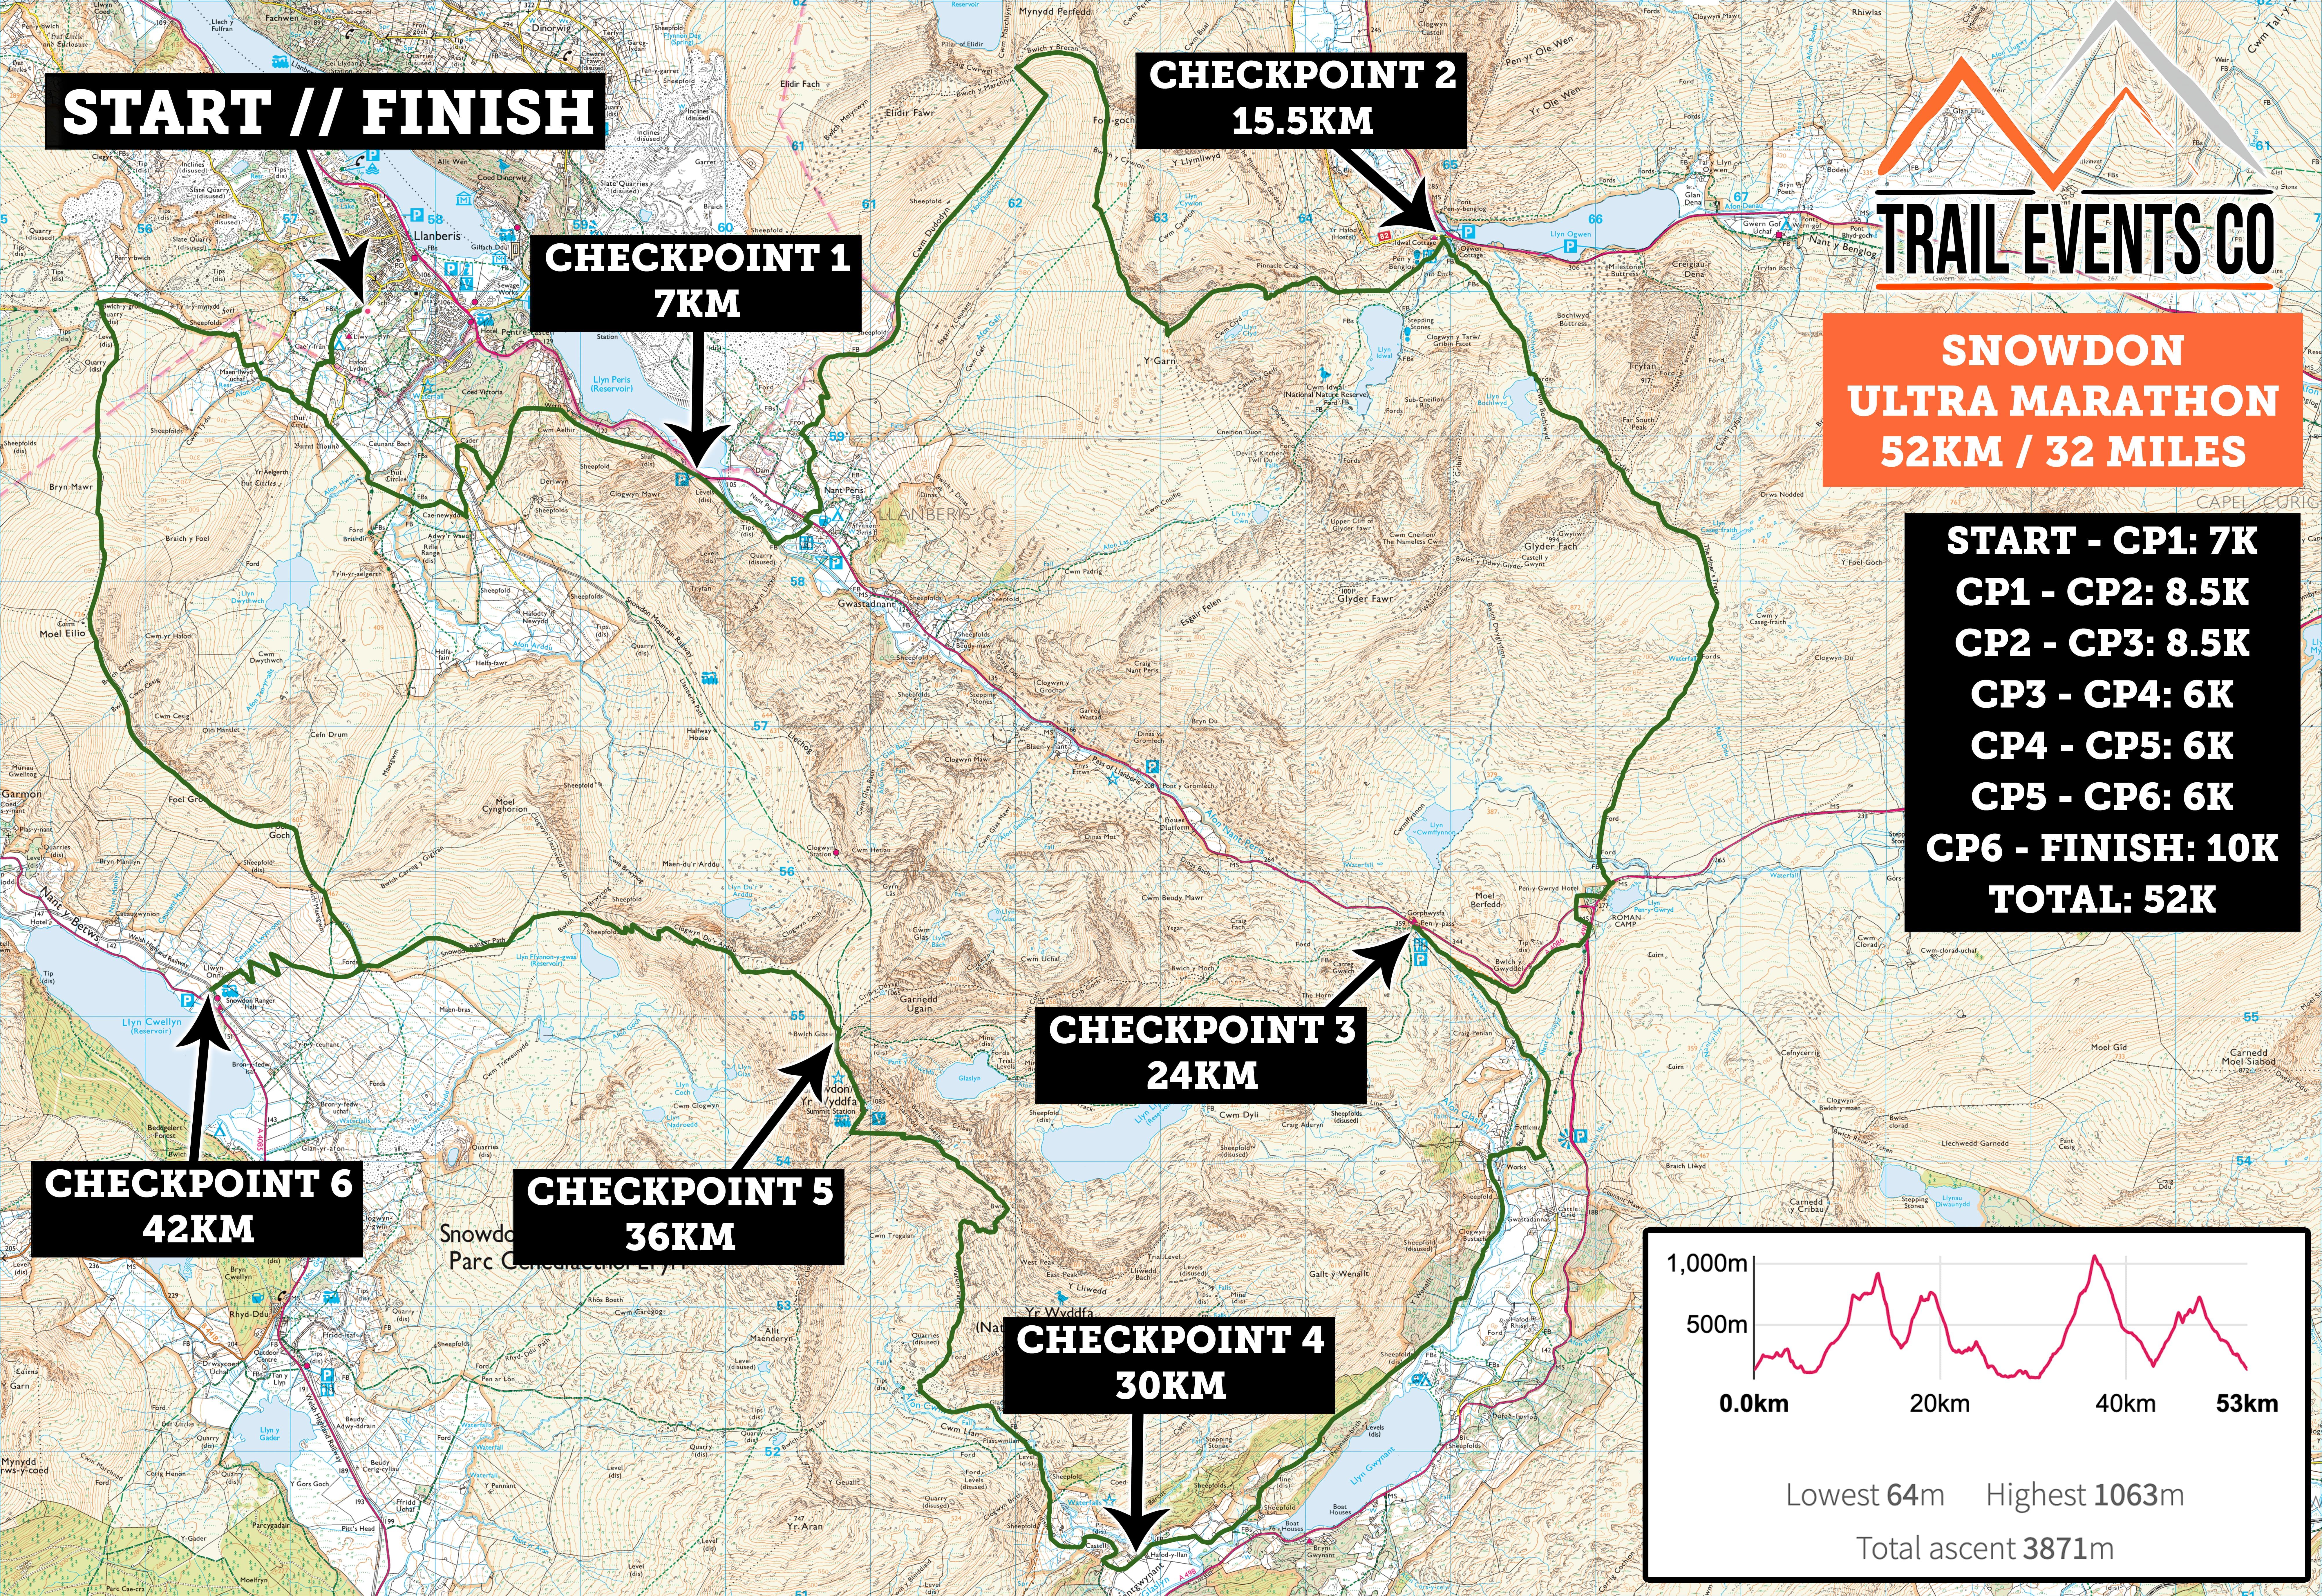 Snowdon Ultra Marathon Route